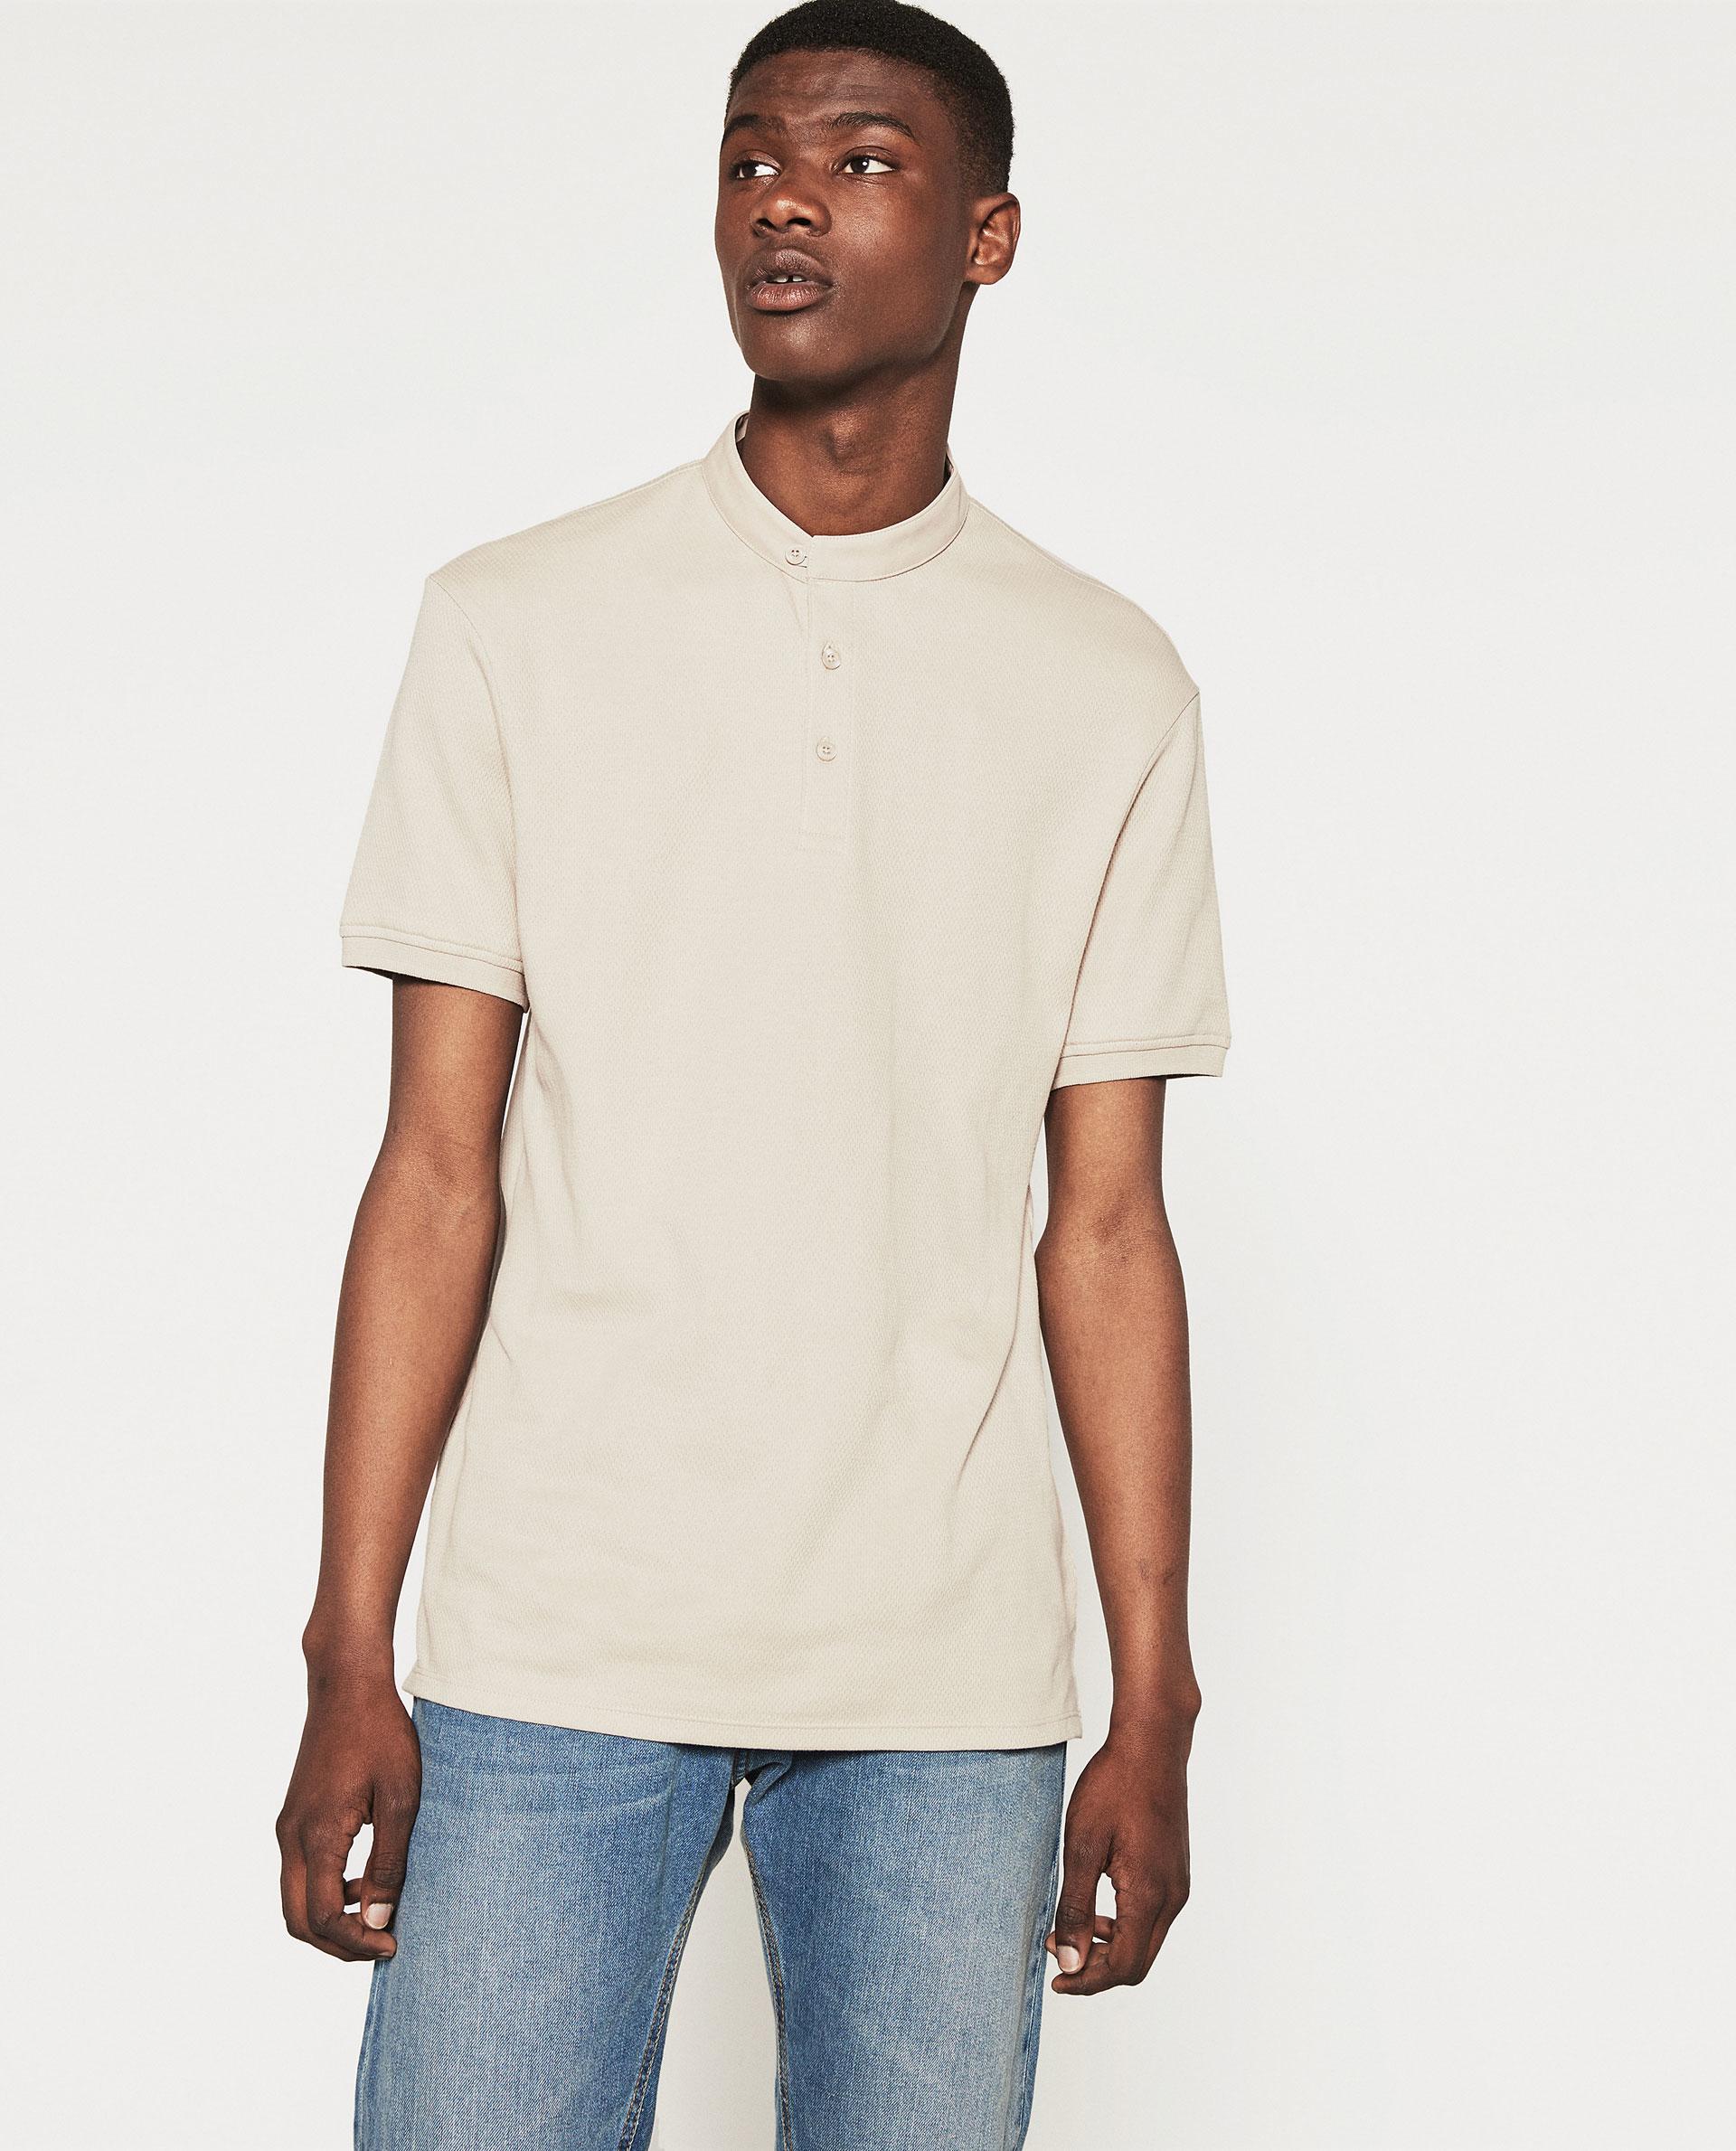 Zara mandarin collar polo shirt in natural for men lyst for Chinese collar shirts for men